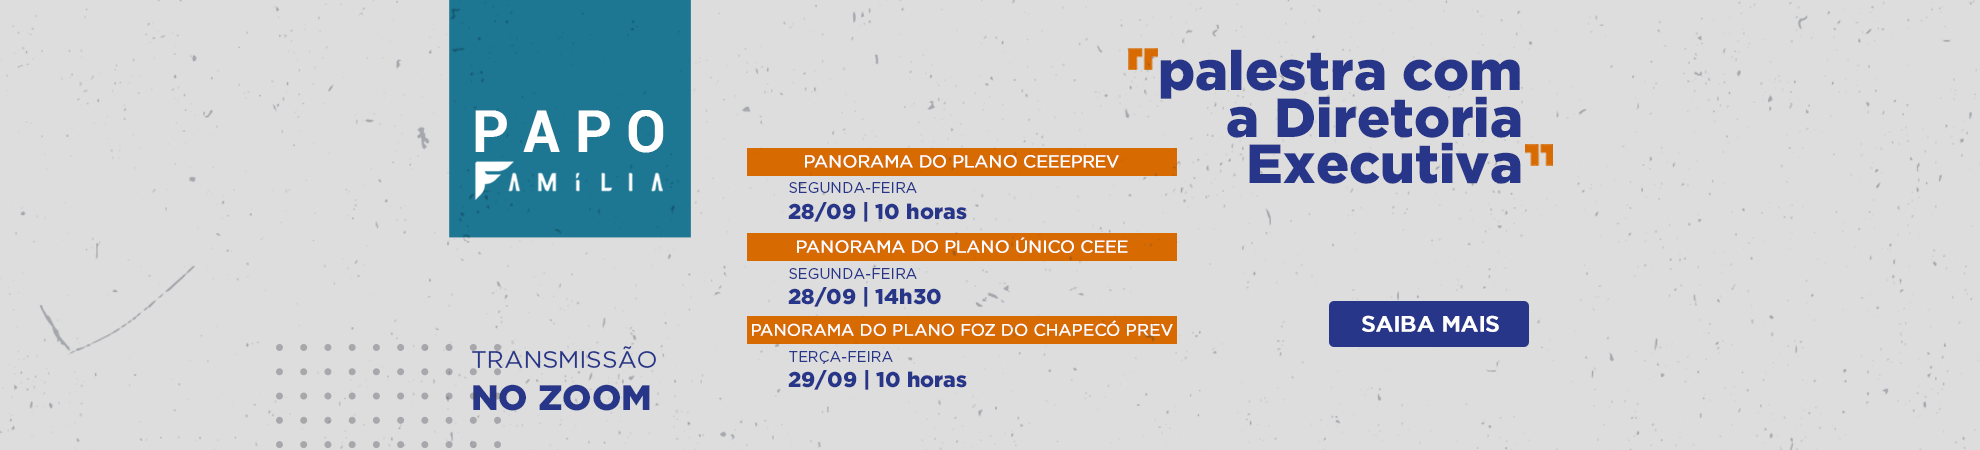 banner_papofamilia2